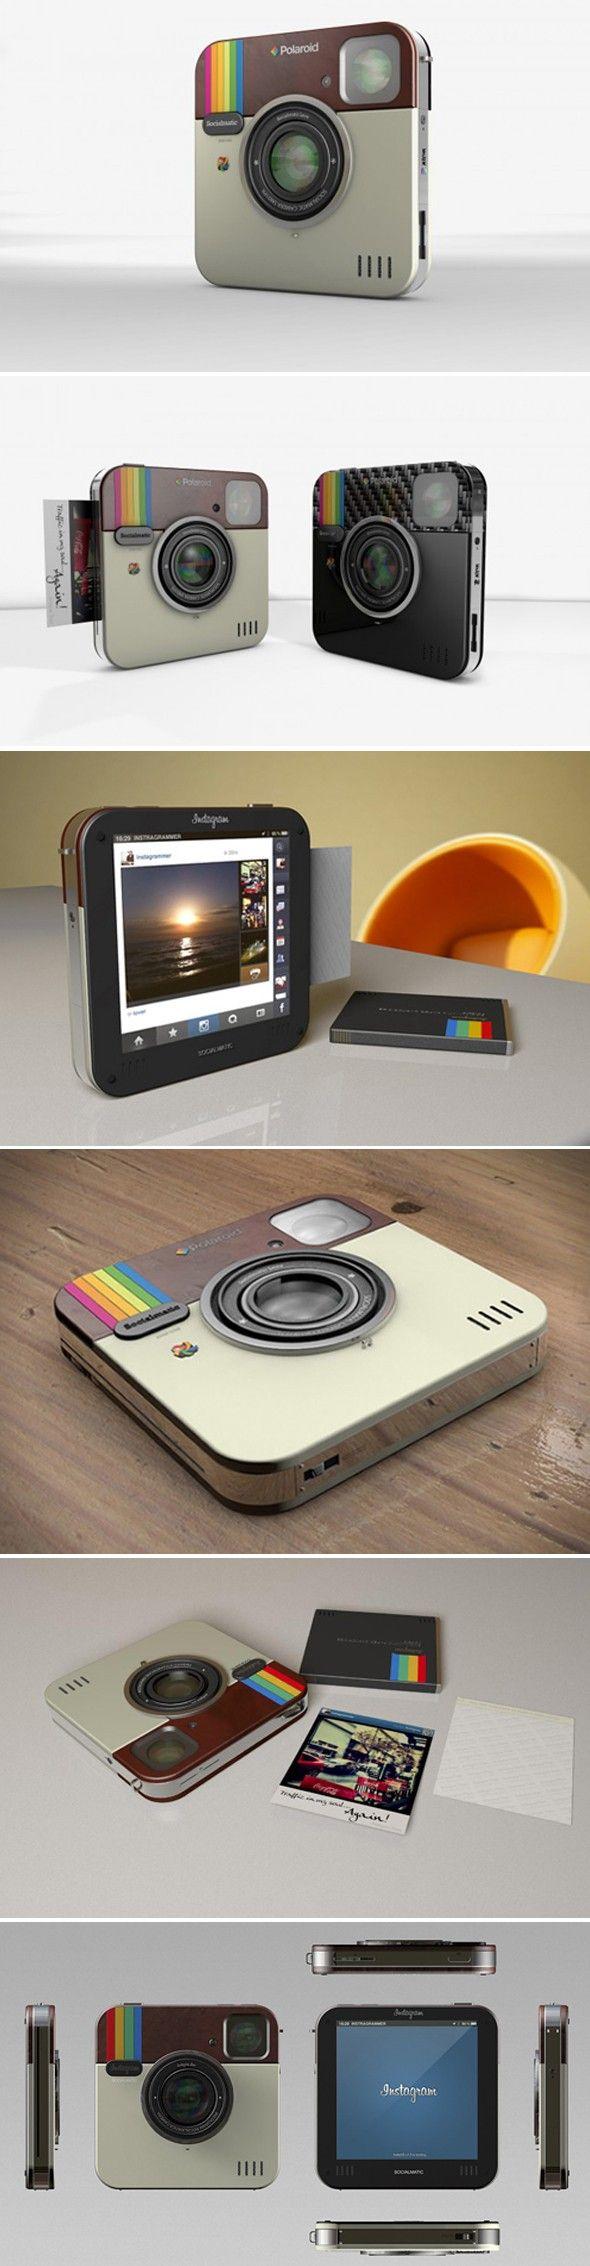 best 25 instax camera ideas on pinterest polaroid camera fujifilm buy polaroid camera and. Black Bedroom Furniture Sets. Home Design Ideas